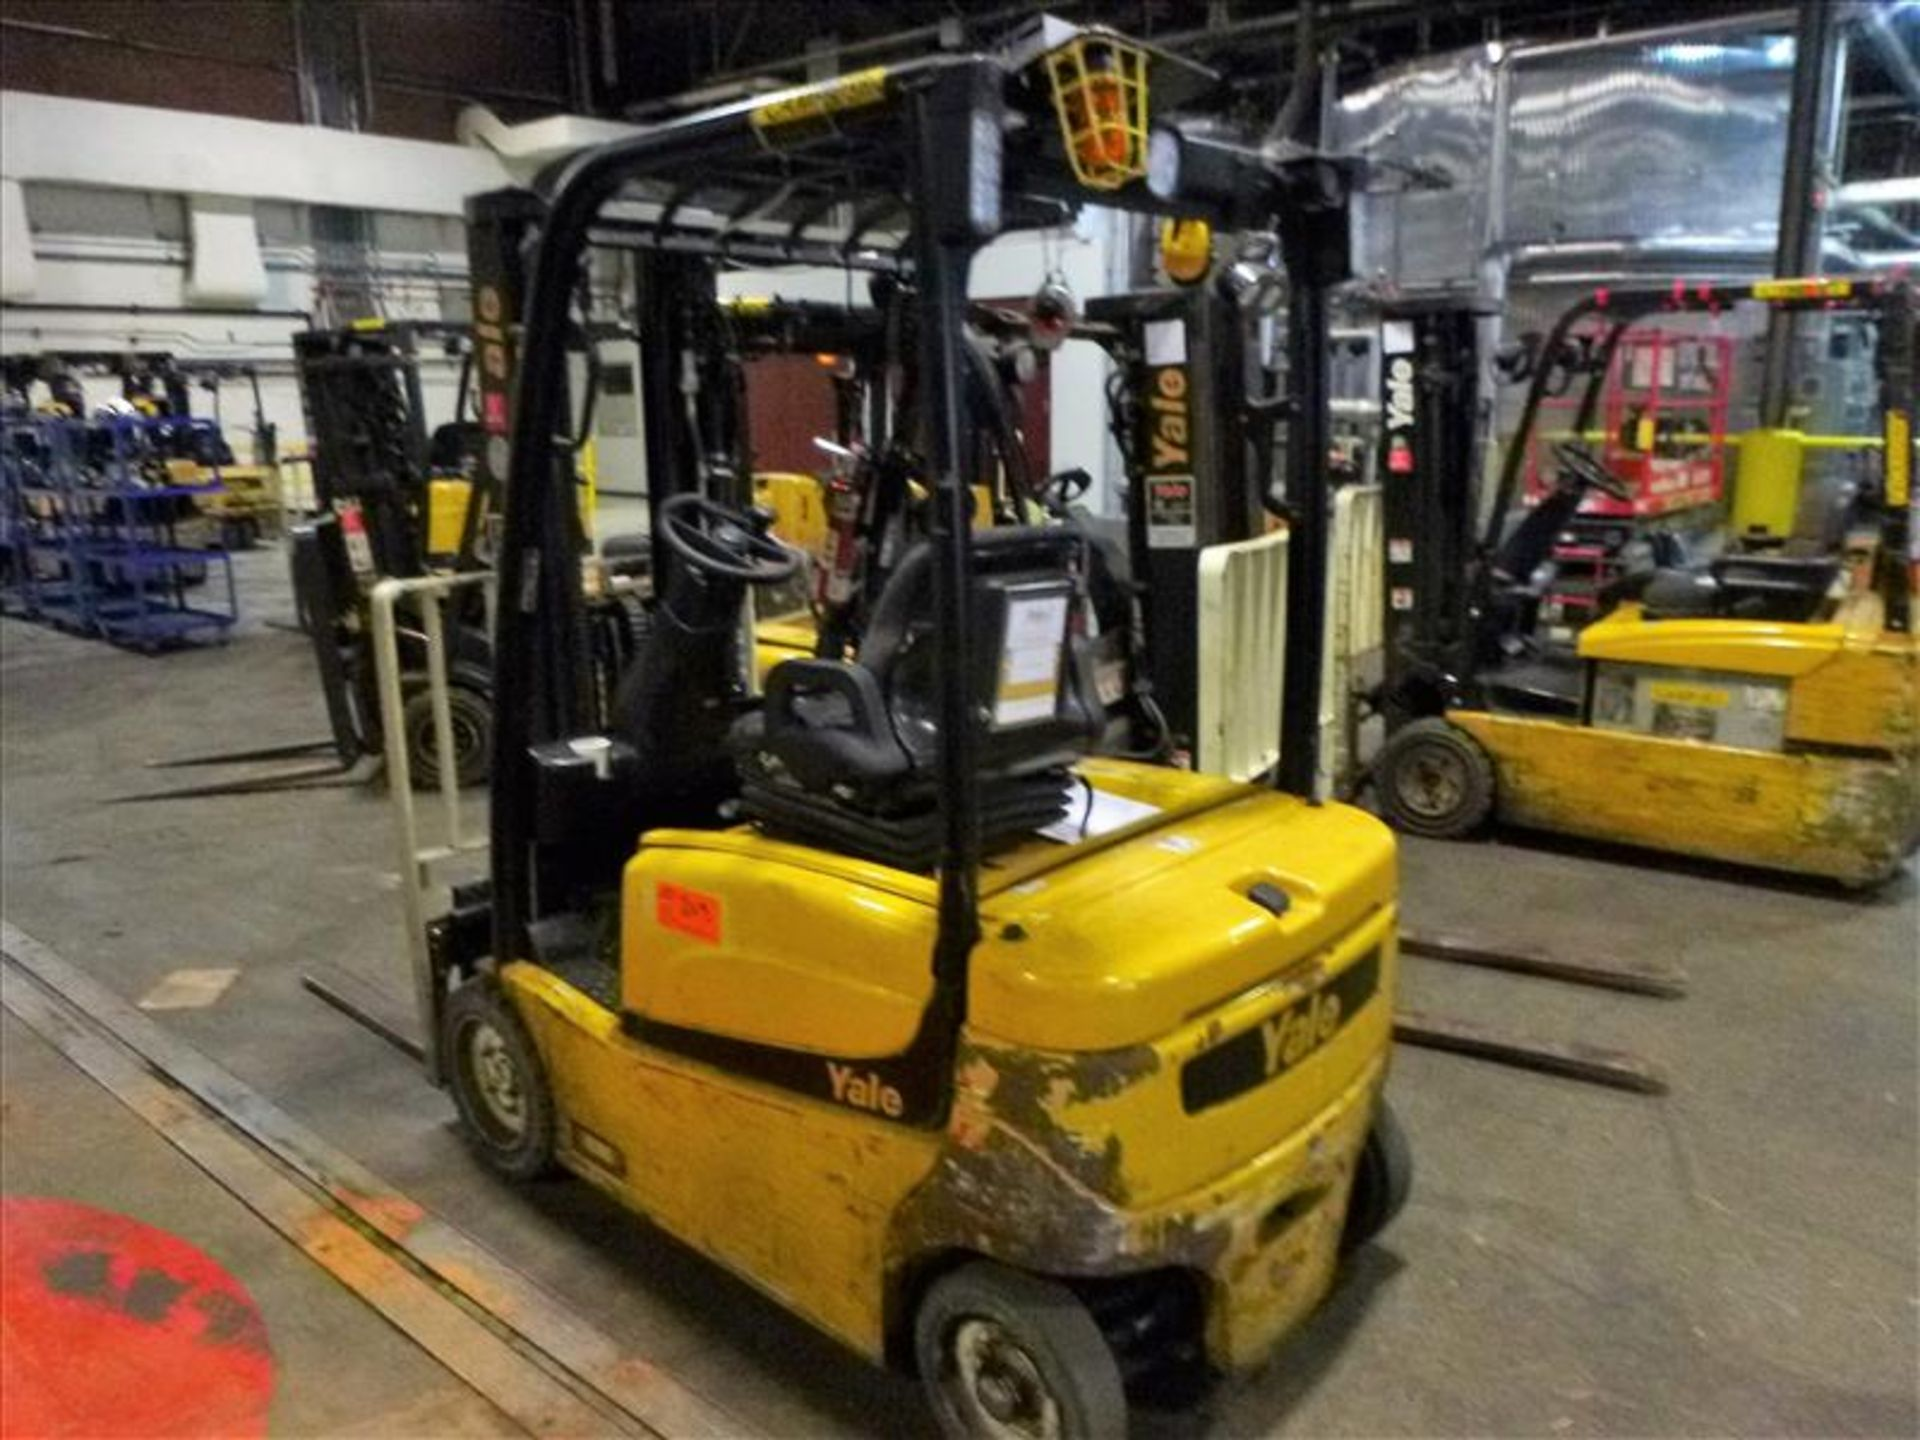 Lot 2013 - Yale fork lift truck, mod. ERP040VFN48TE082, ser. no. A955N02396M, 48V electric, 3700 lbs cap.,